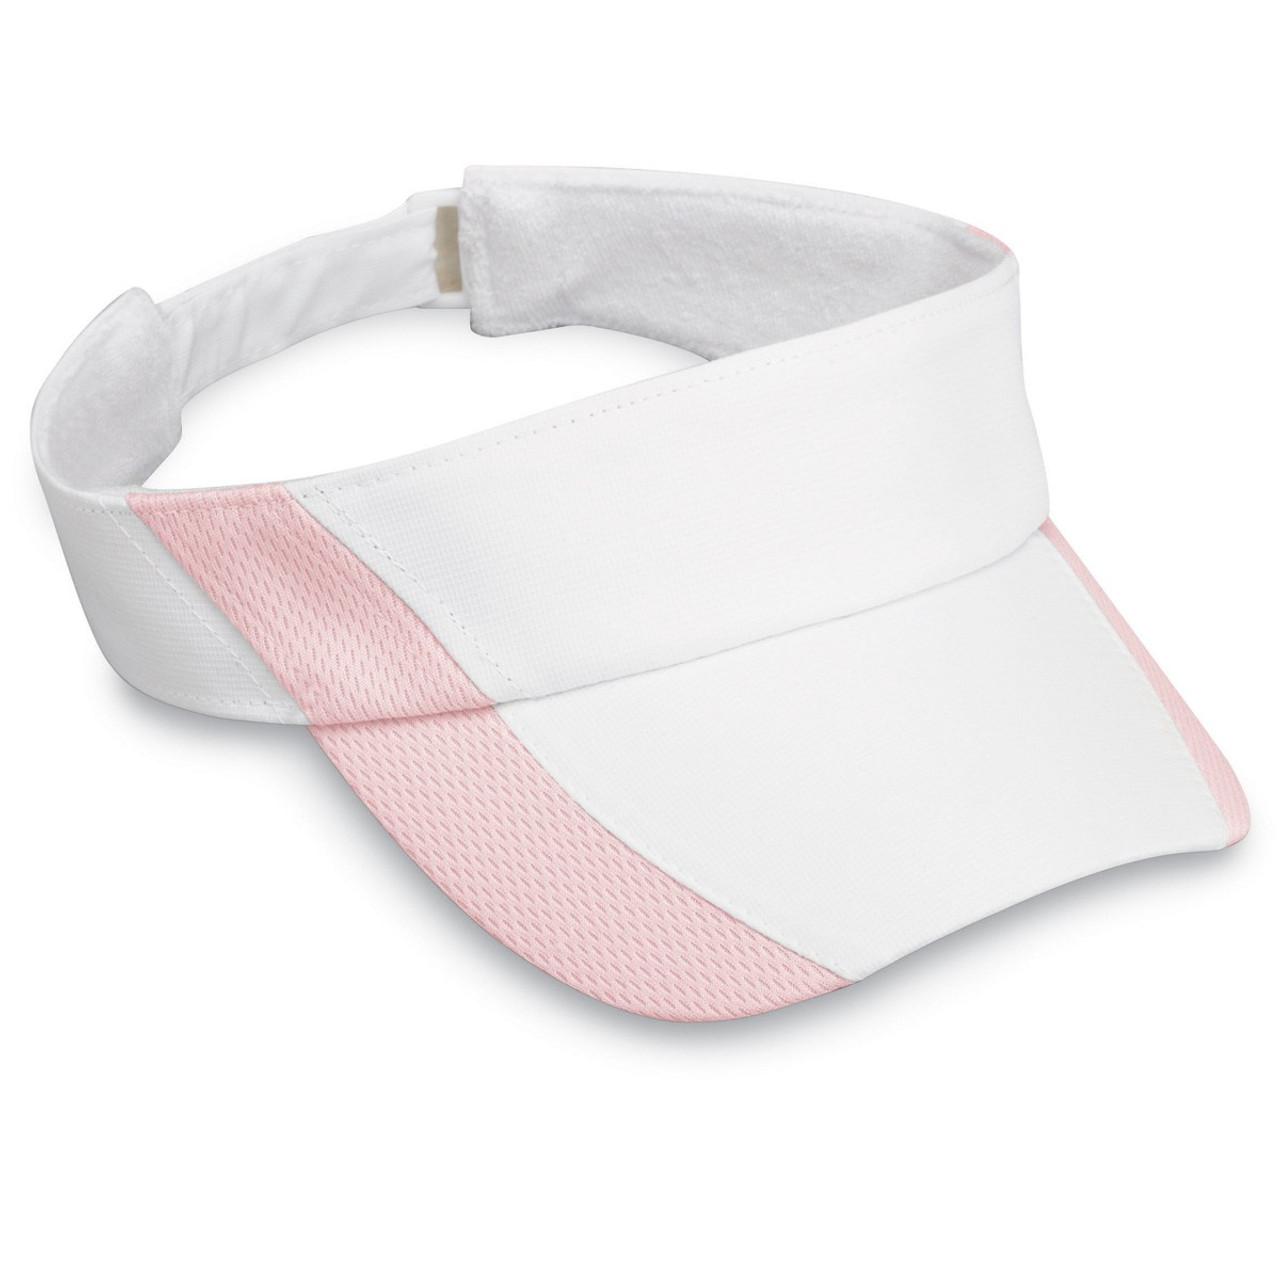 Womens wallaroo sports visor white pink 67be6f584bc5